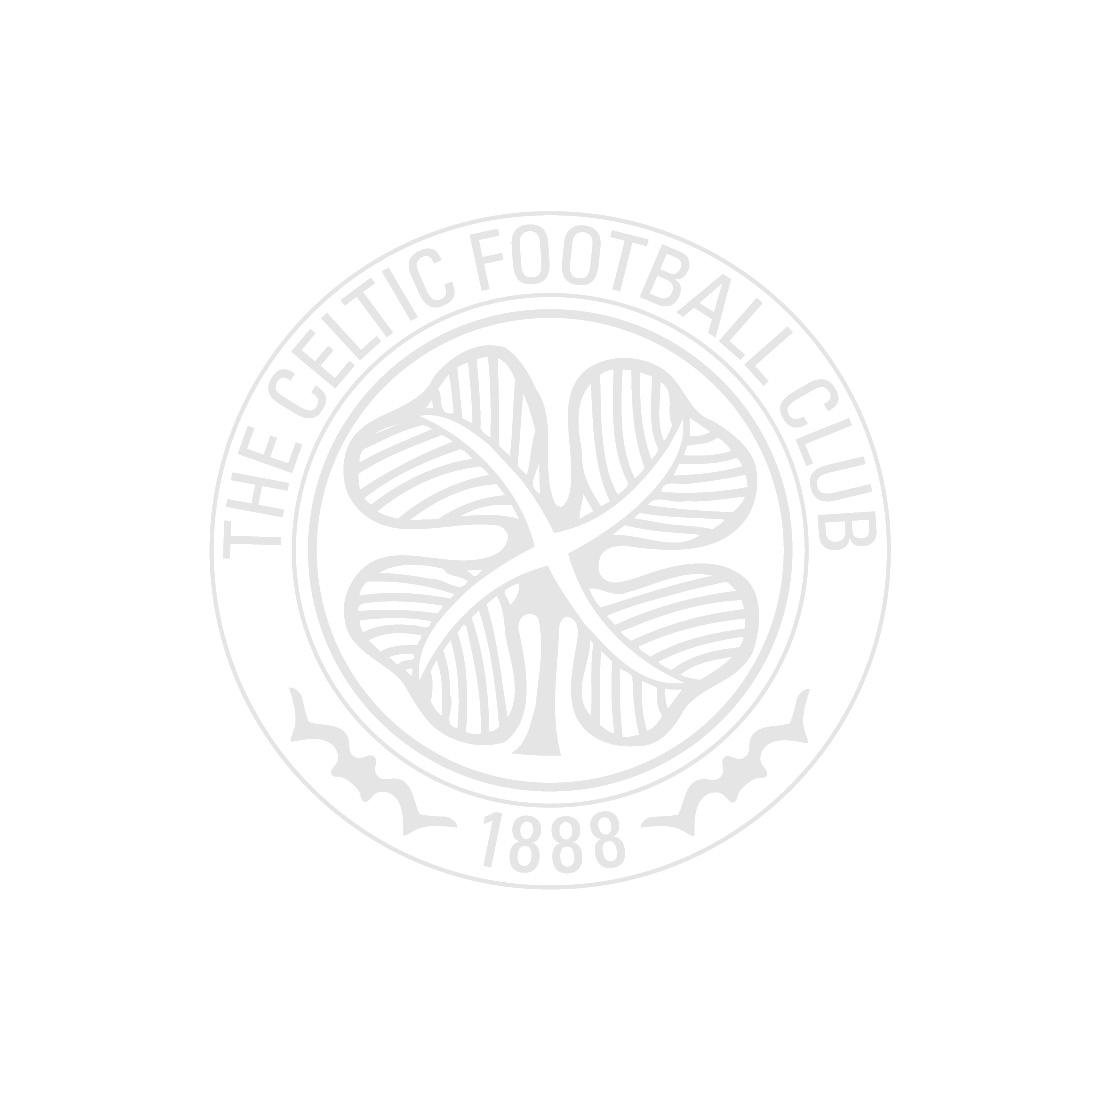 Celtic Away Bar Scarf